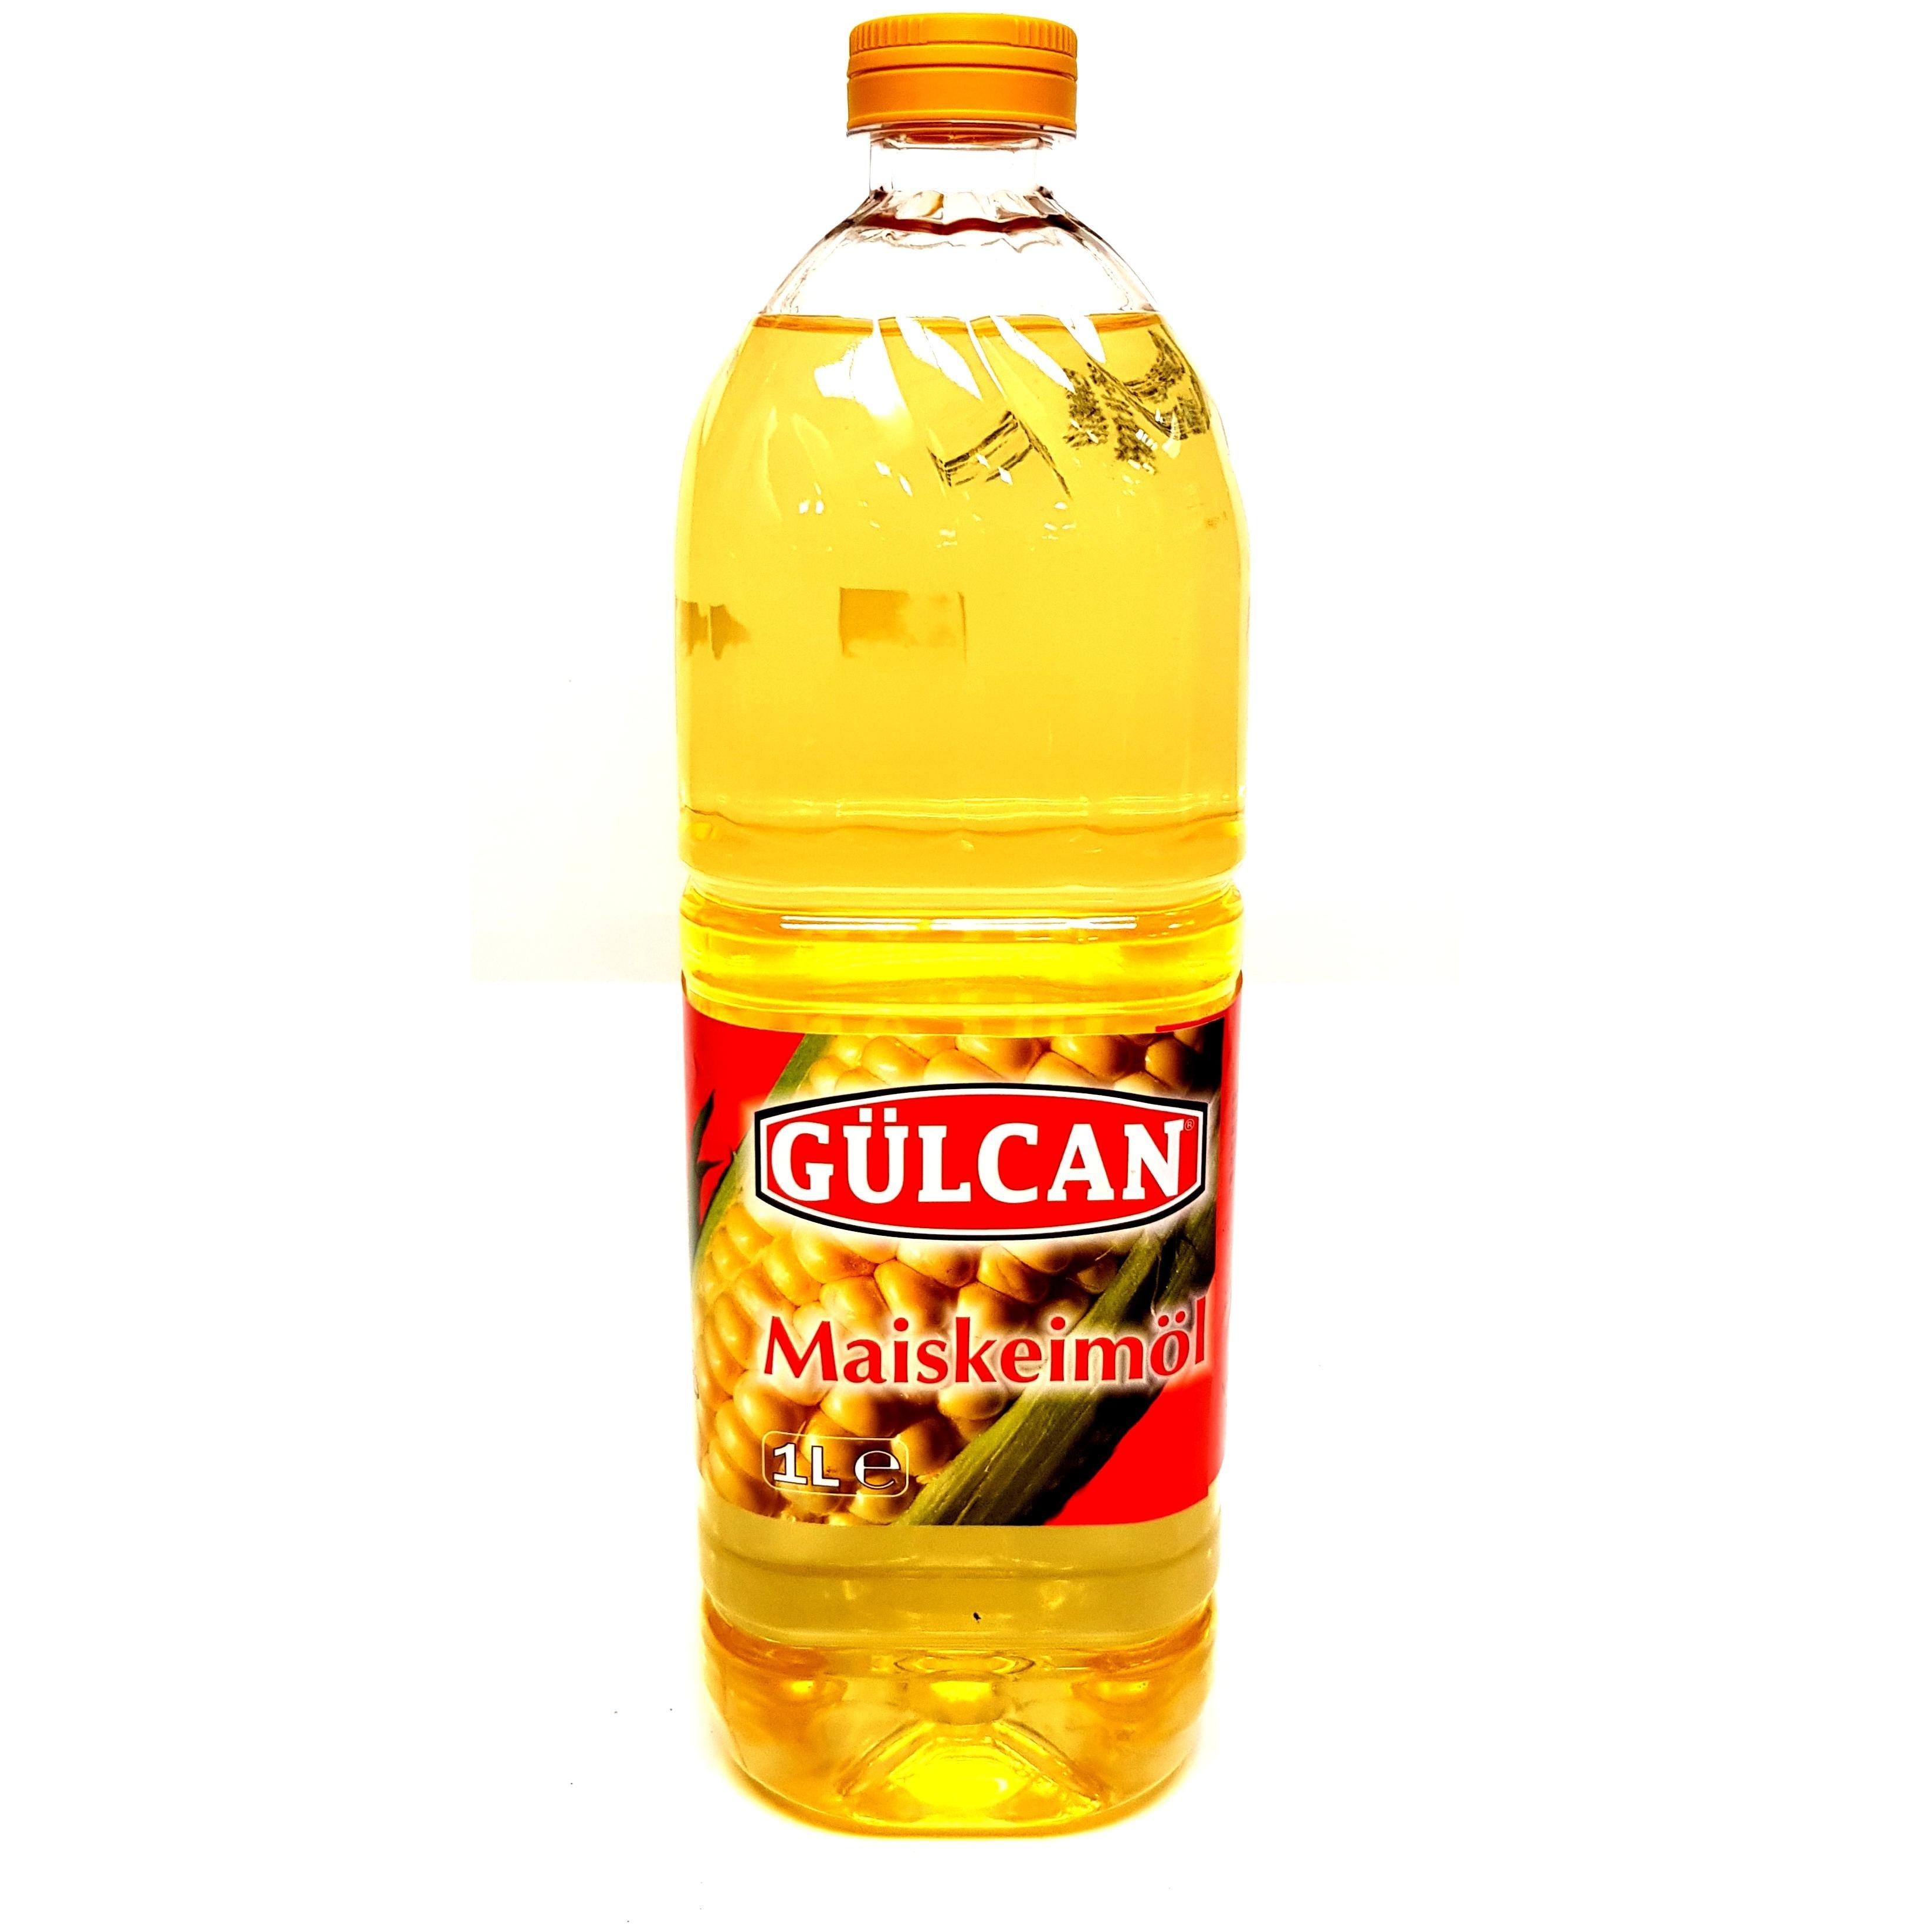 Gülcan Premium Maiskeimöl 1 Liter